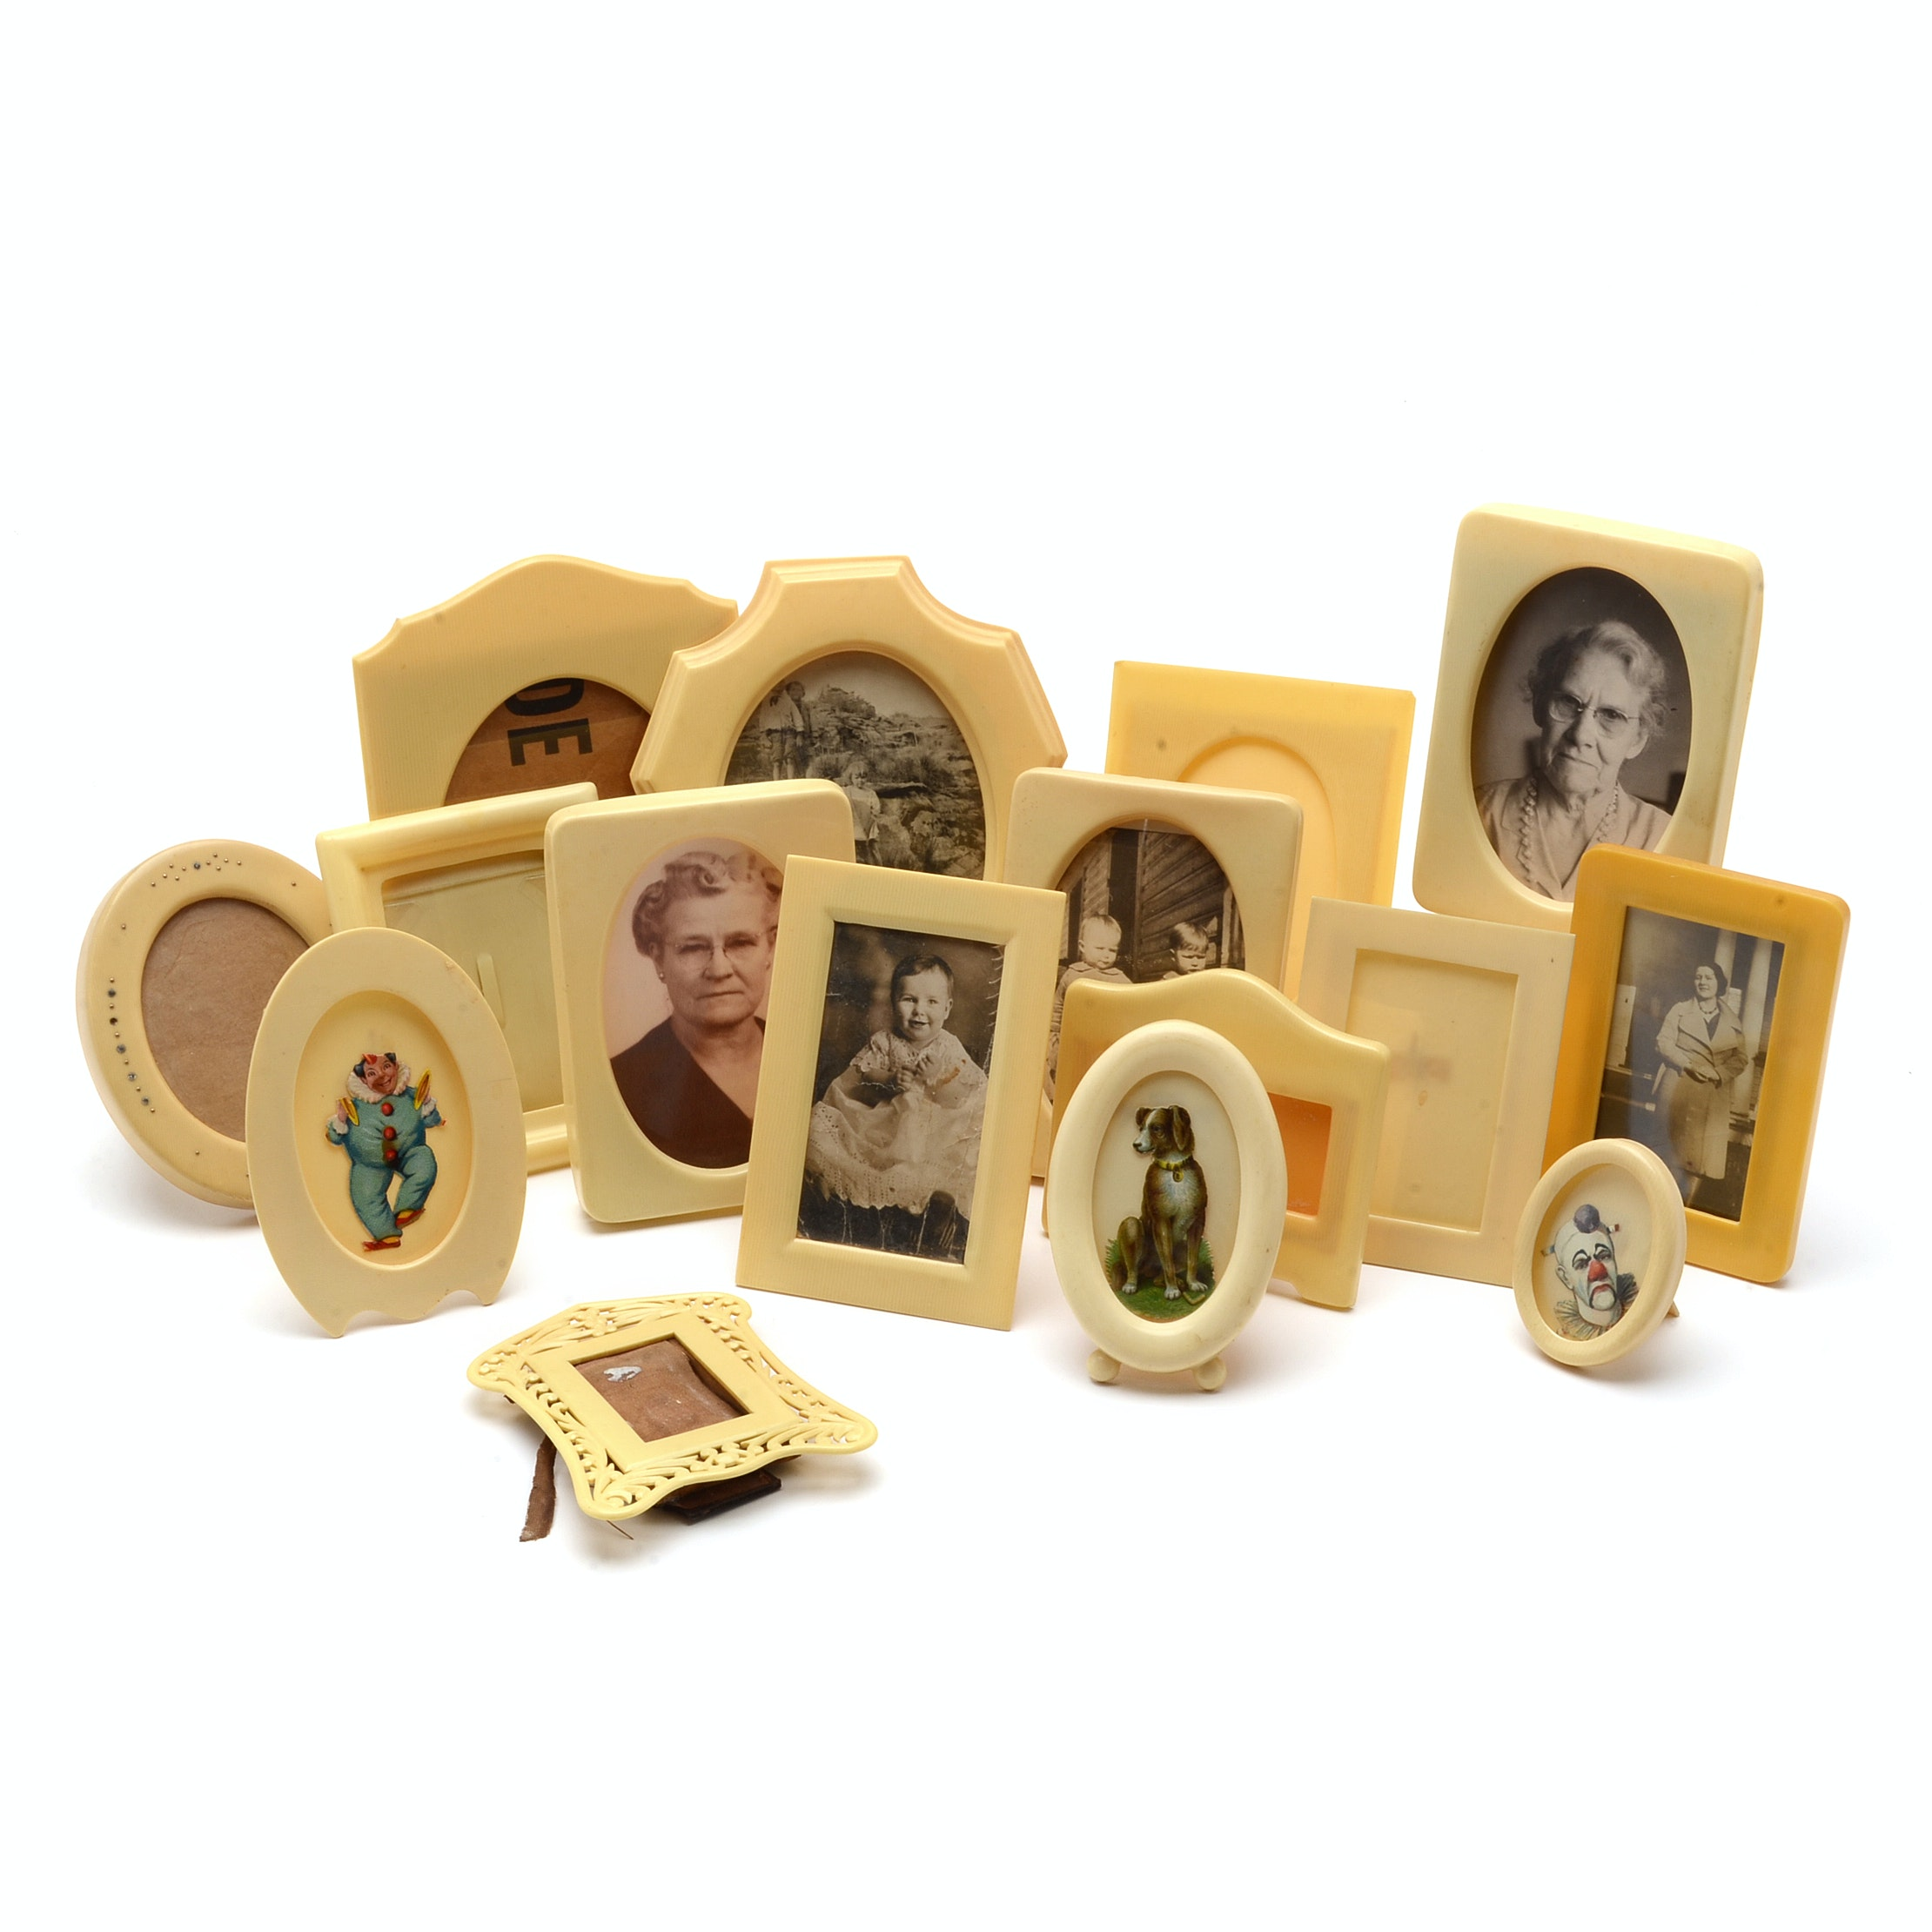 Vintage French Ivory Pyralin Frames